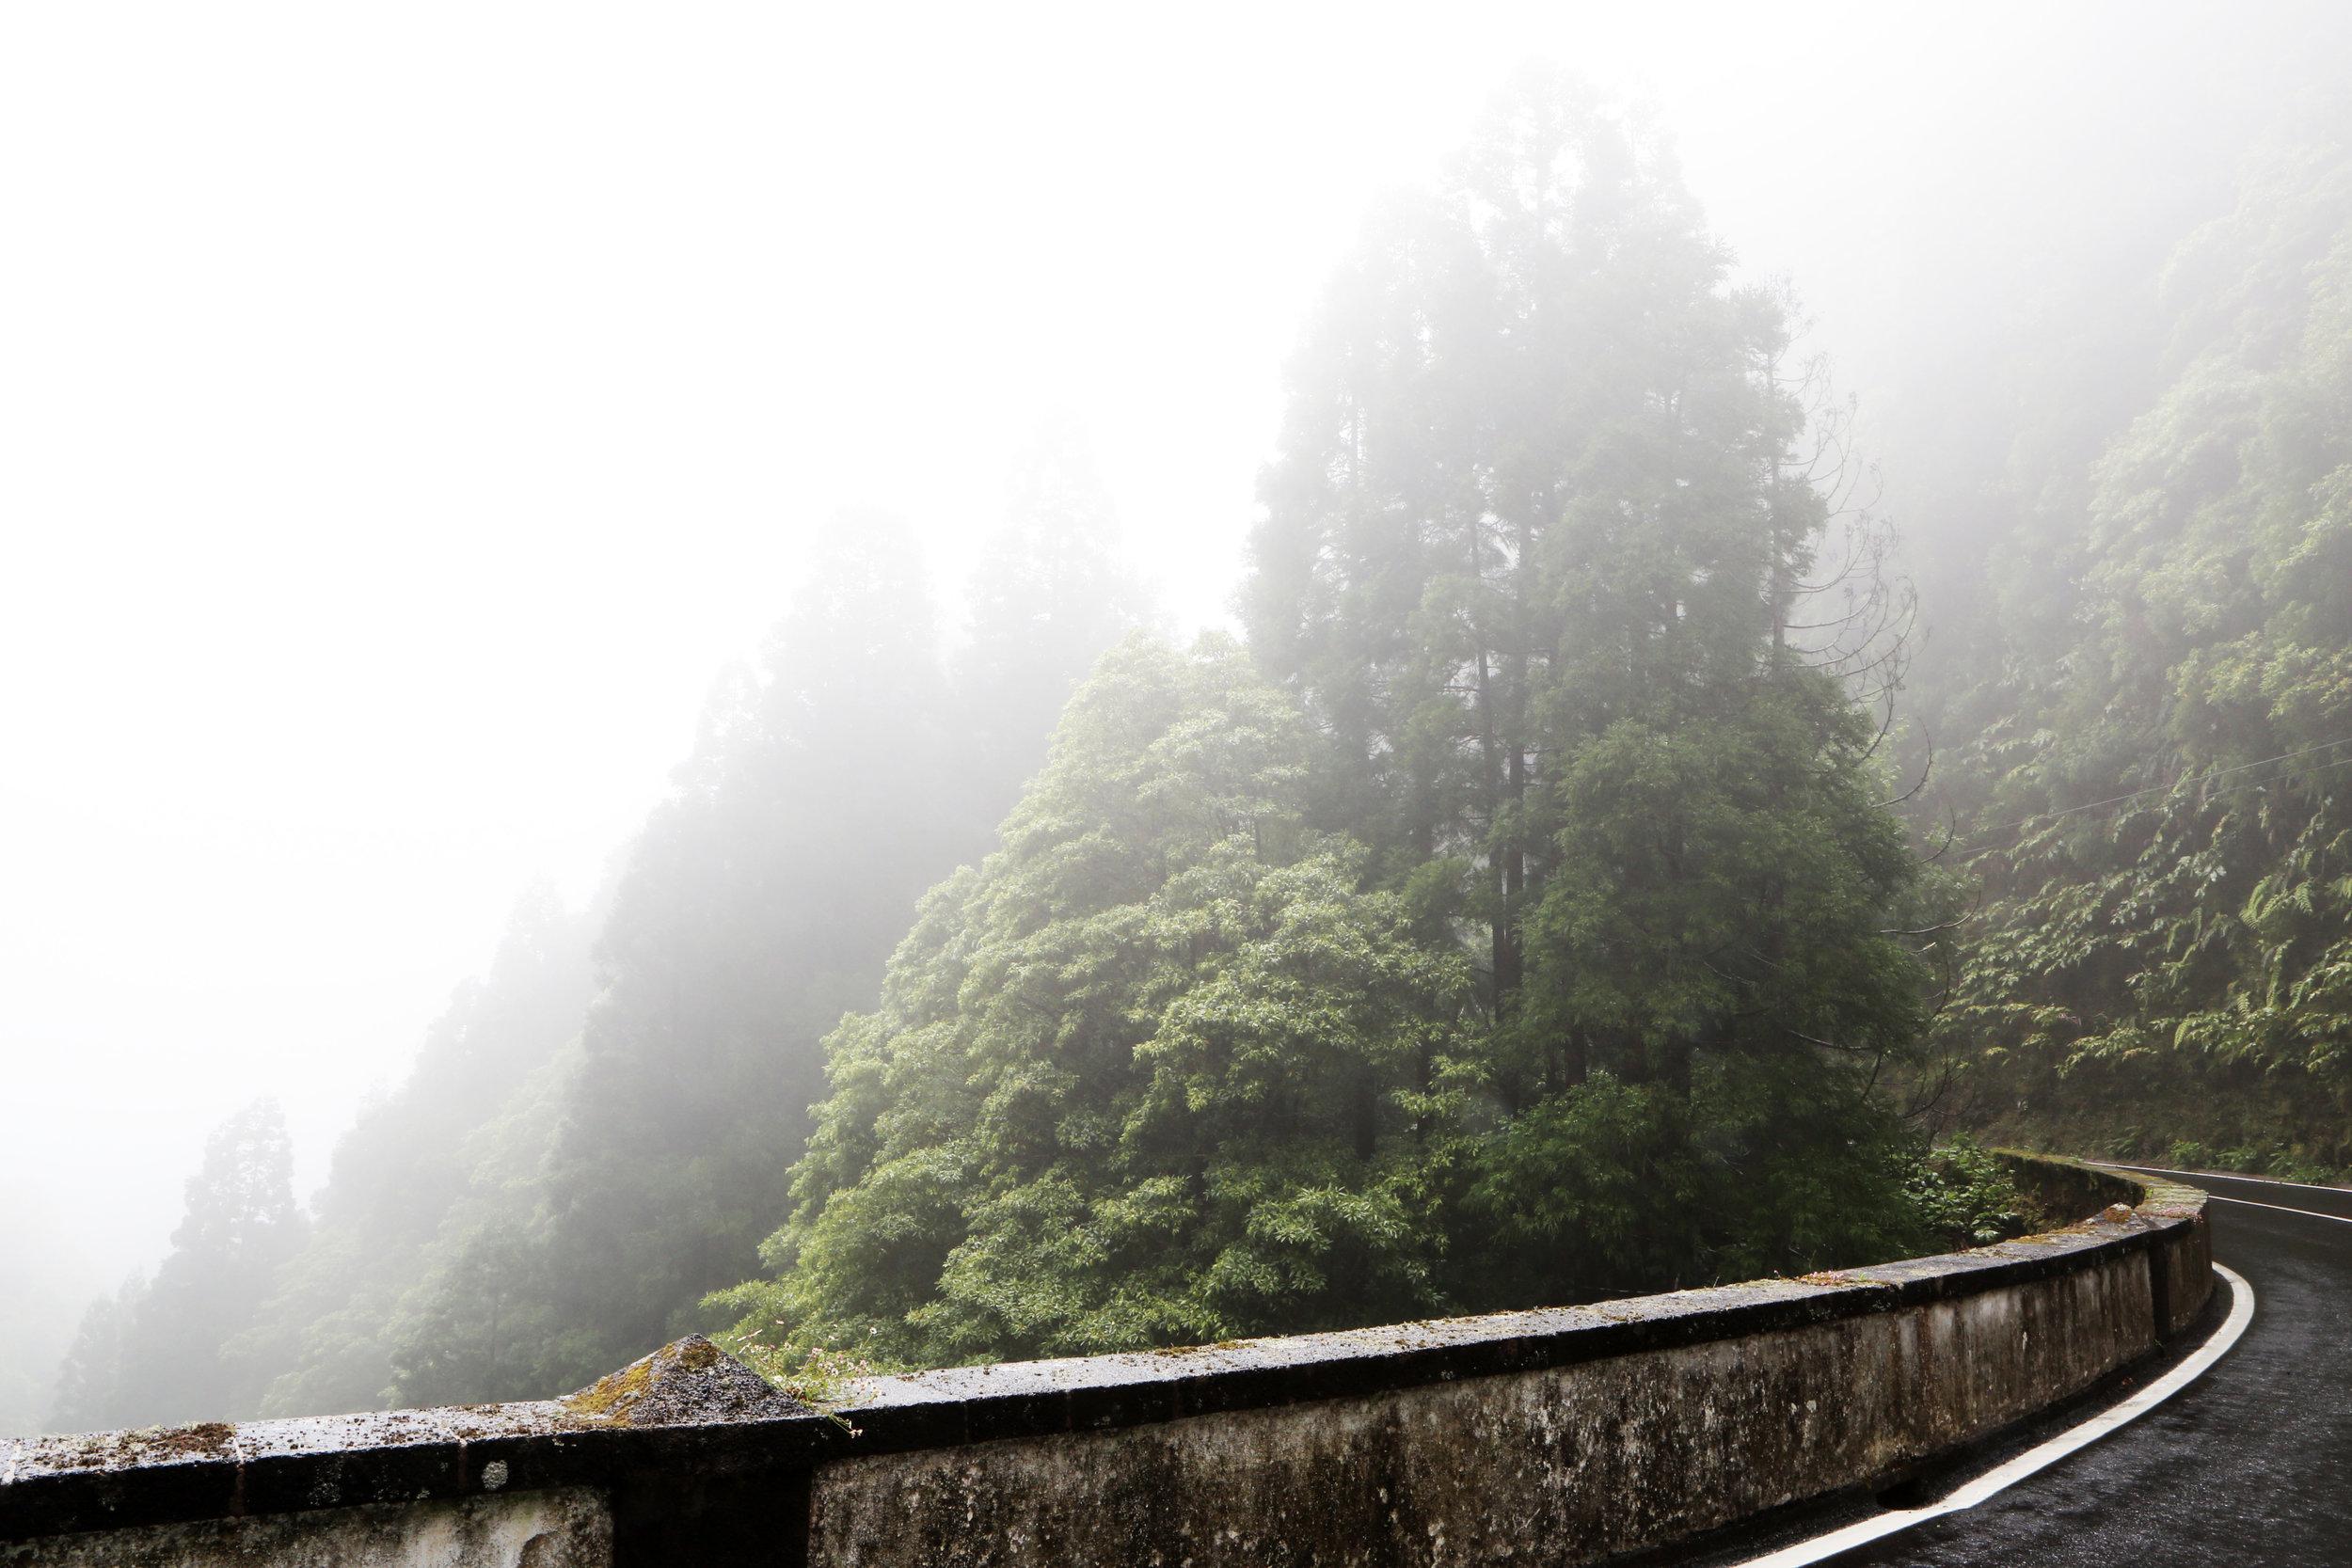 2016-08-Life-of-Pix-free-stock-road-mist-trees-LEEROY.jpg